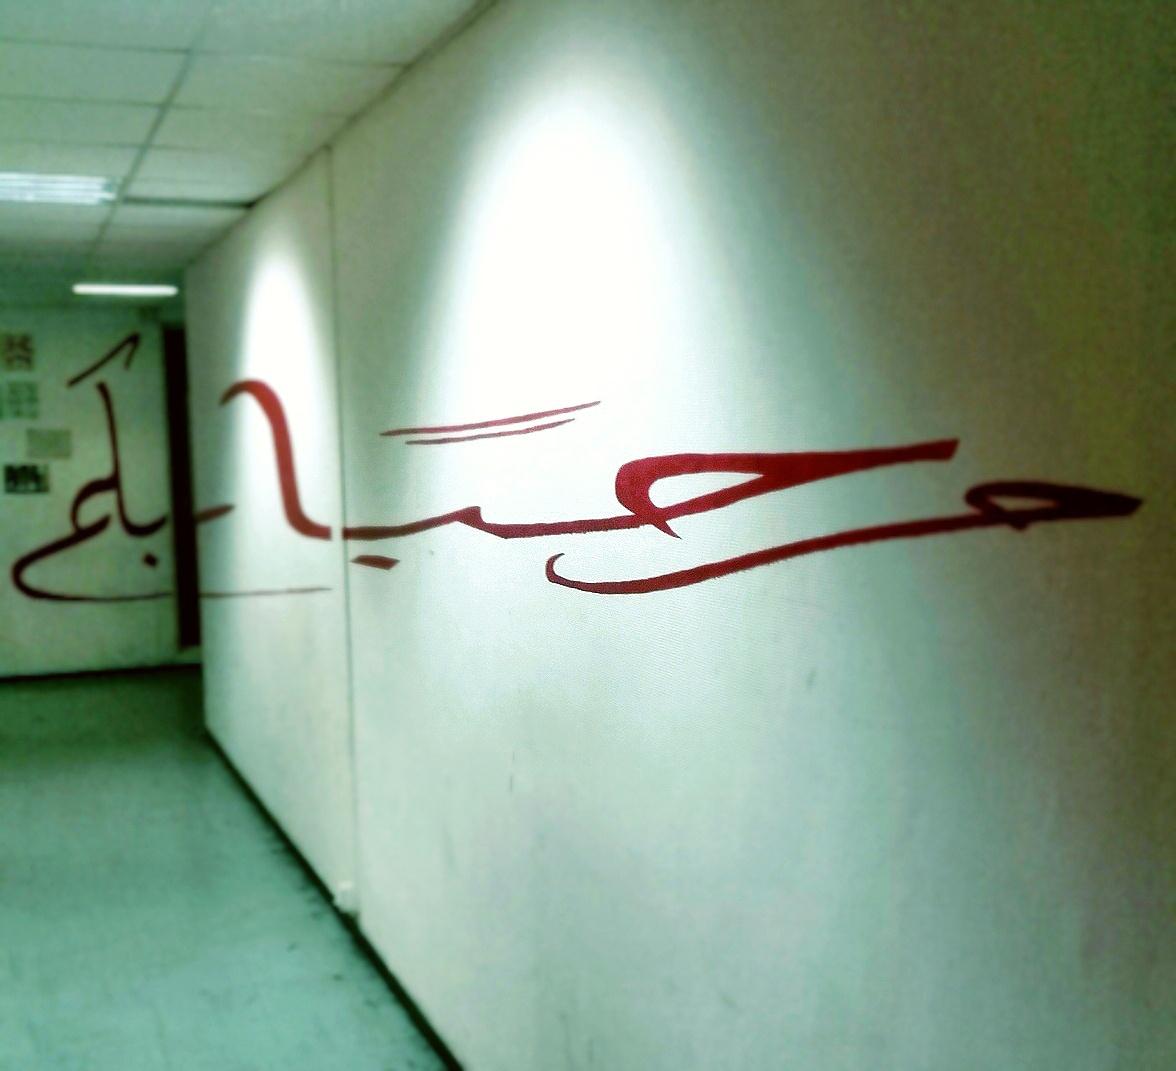 bienvenue_arabe_2